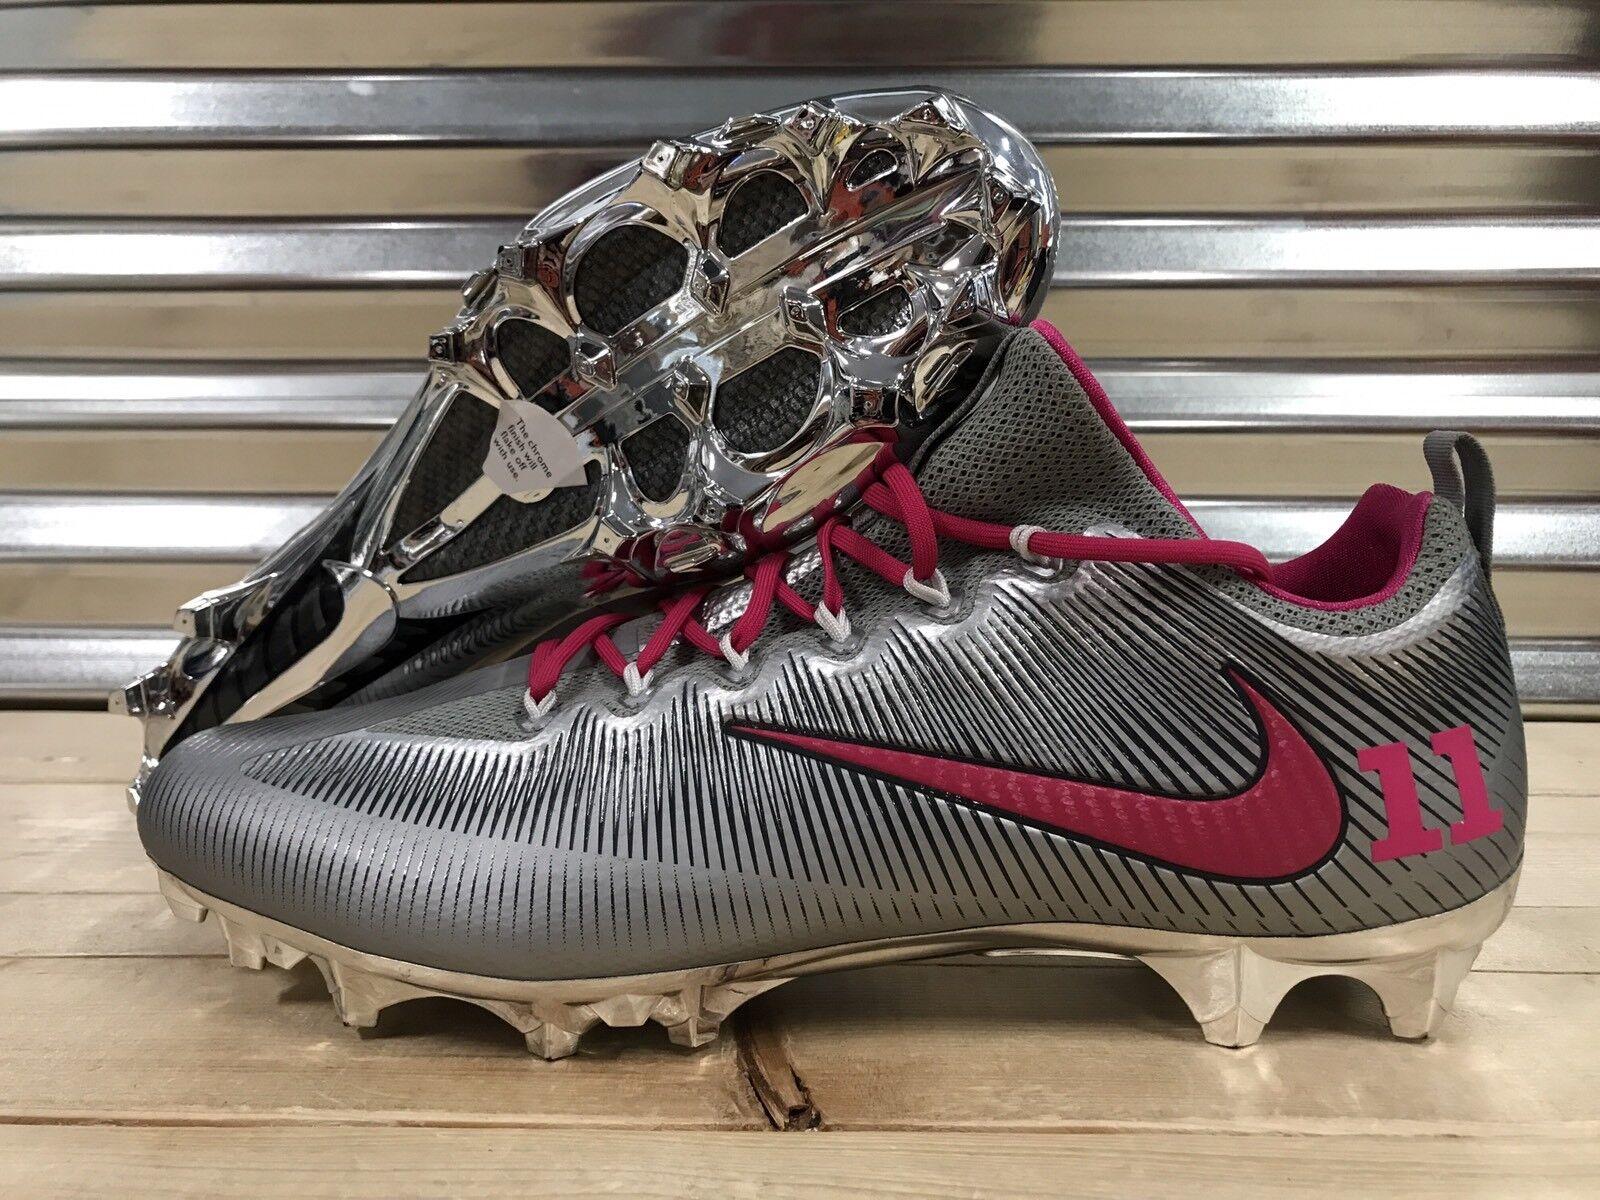 7c52af8b6 Nike Vapor Untouchable Pro ID Football Cleats Metallic Silver Chrome ...